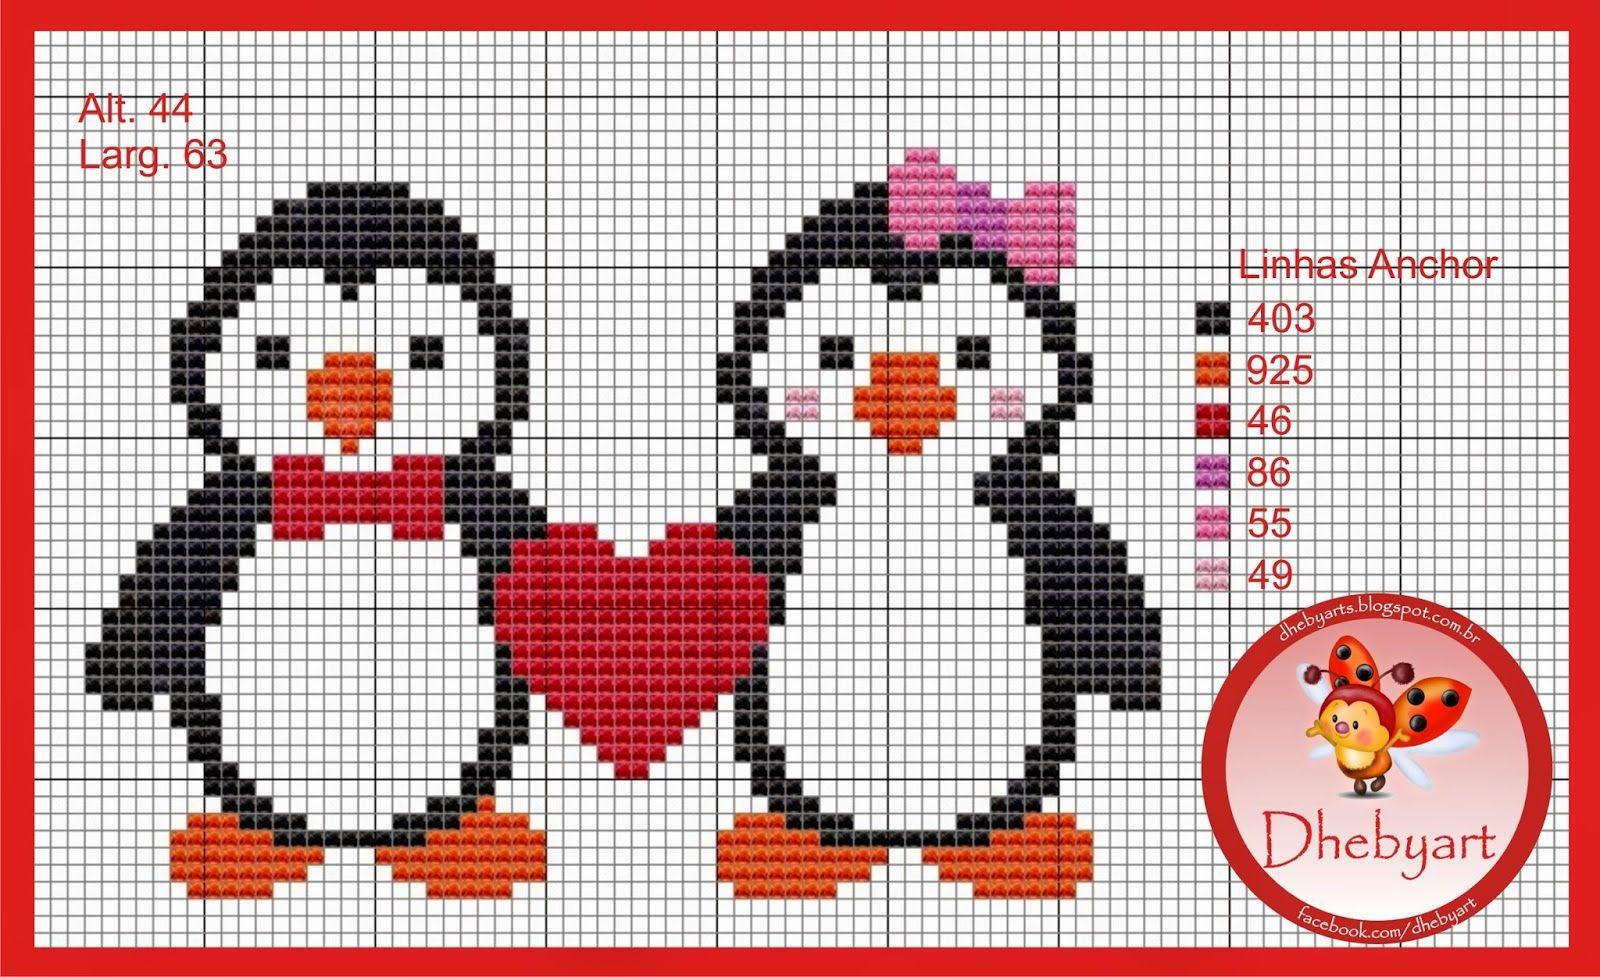 Gráfico Pinguins!